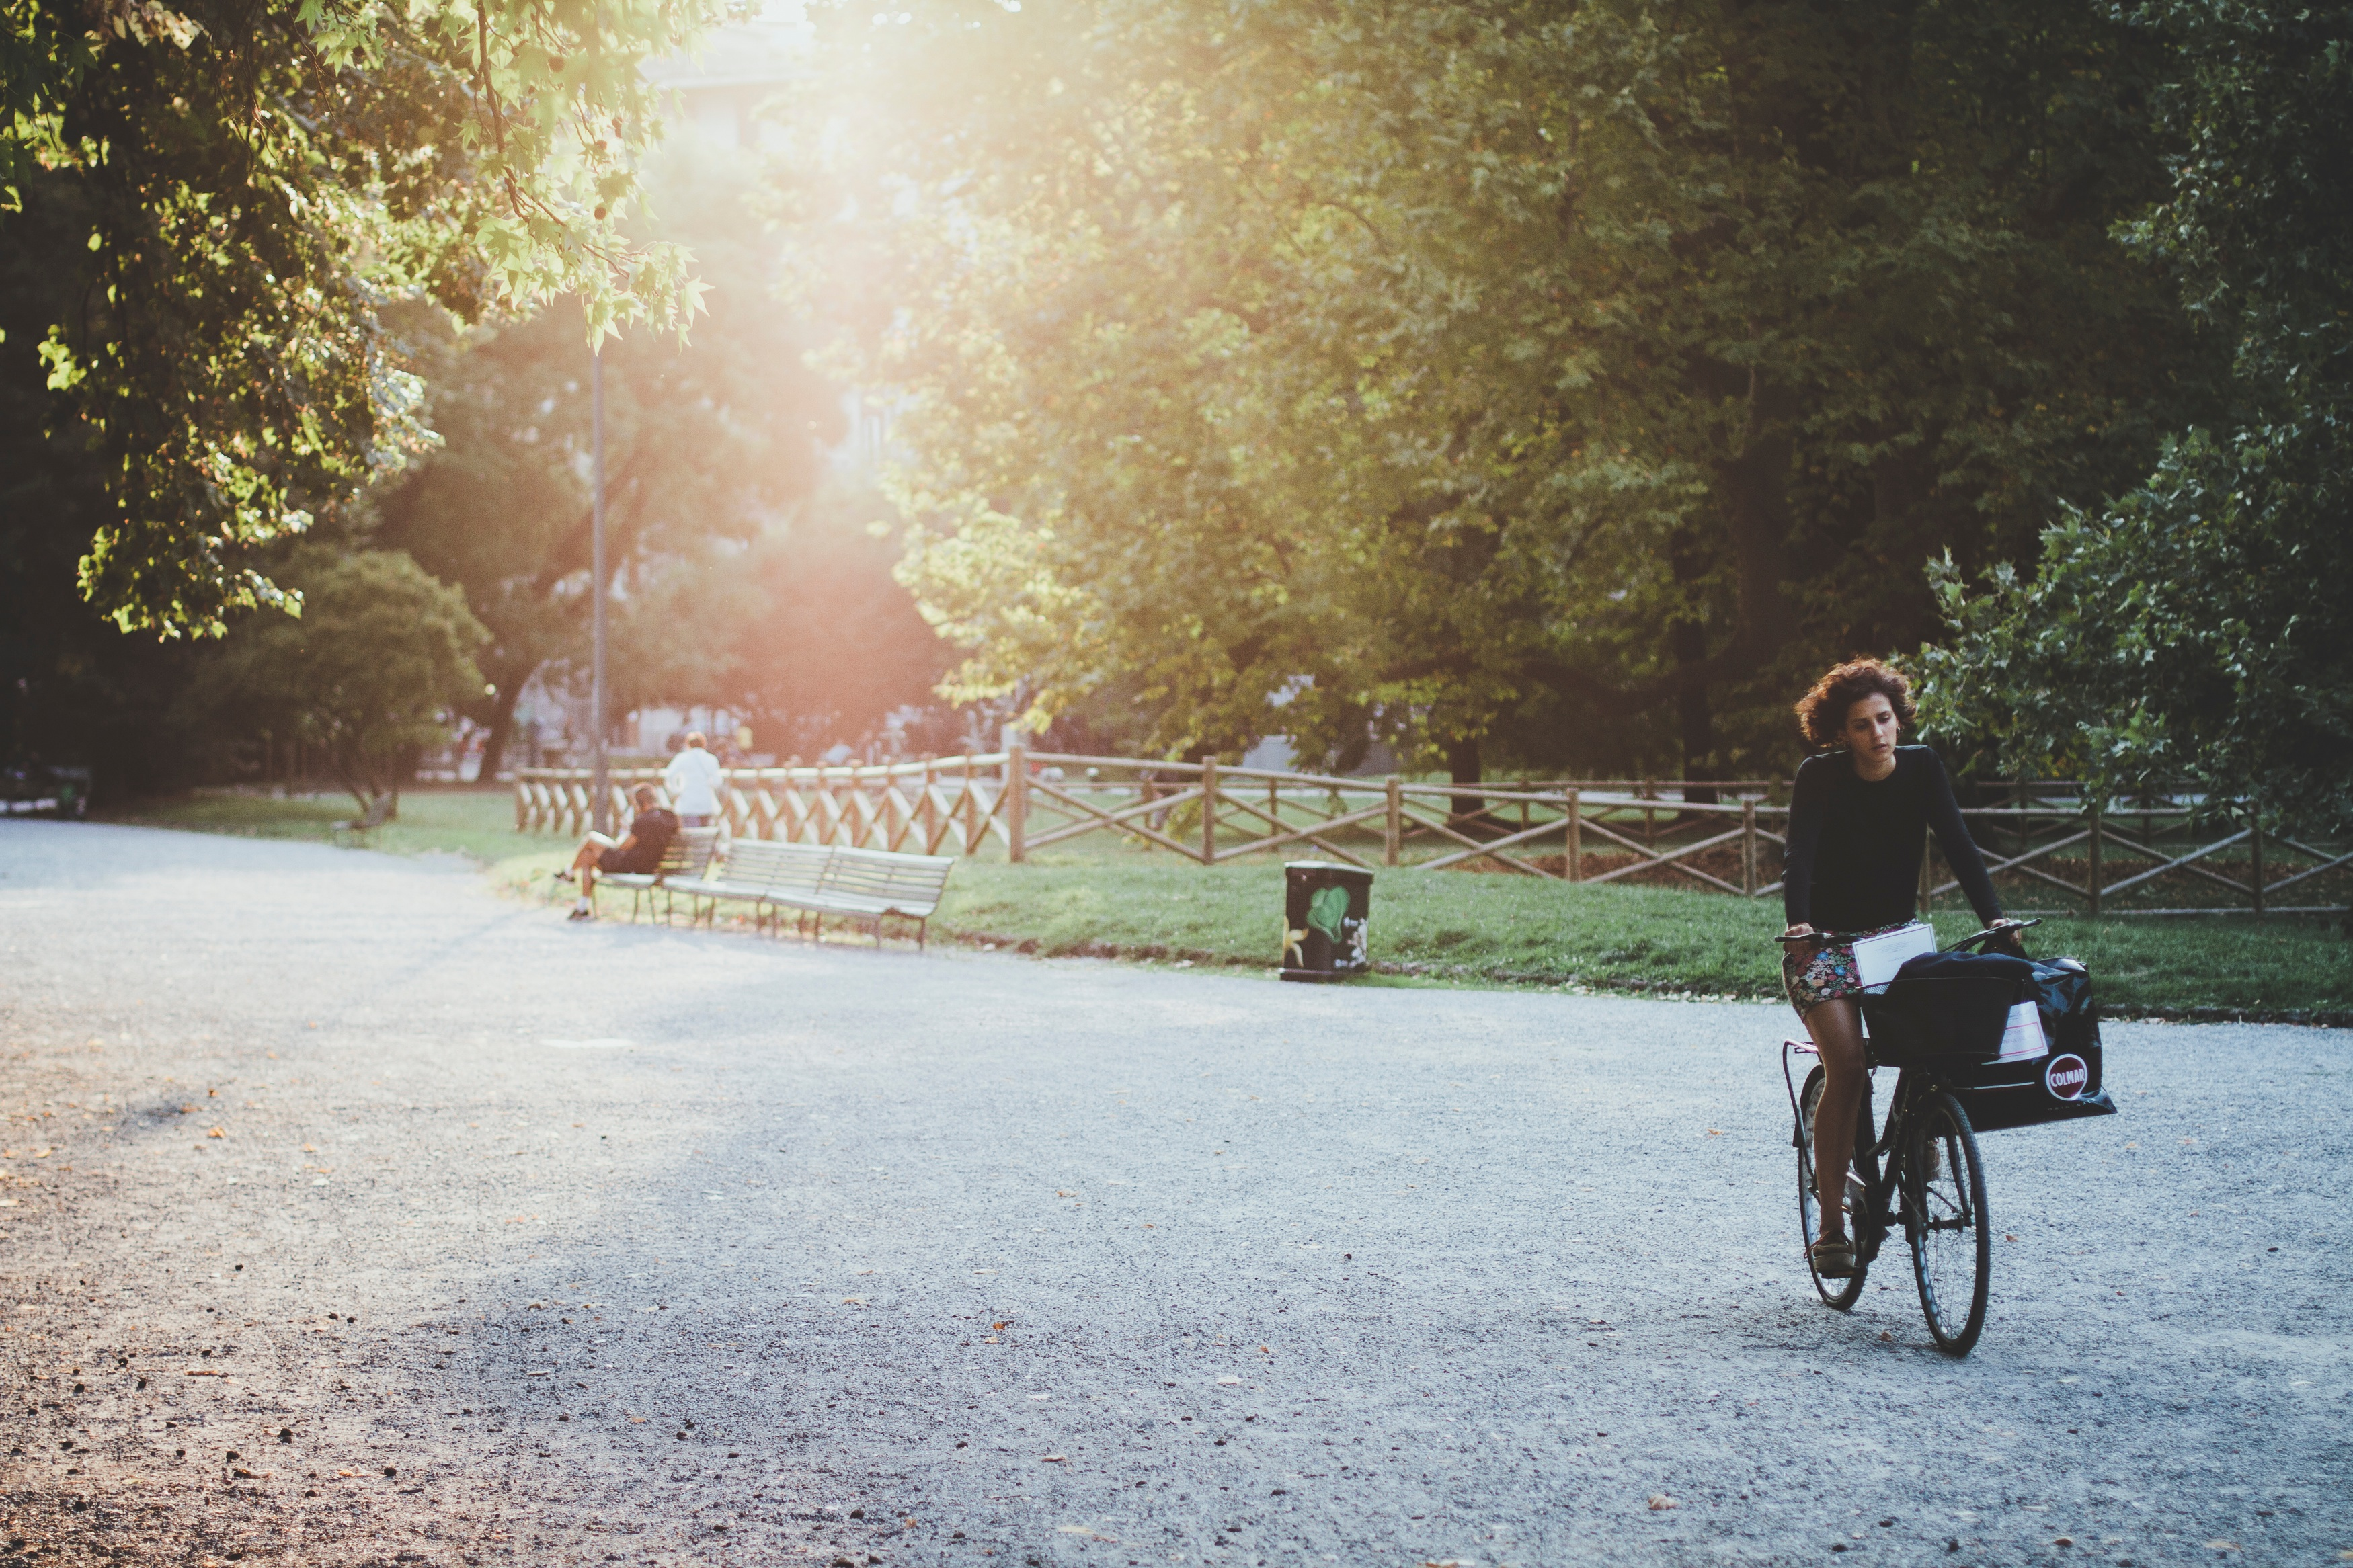 Midtown Cycleway Feasibility